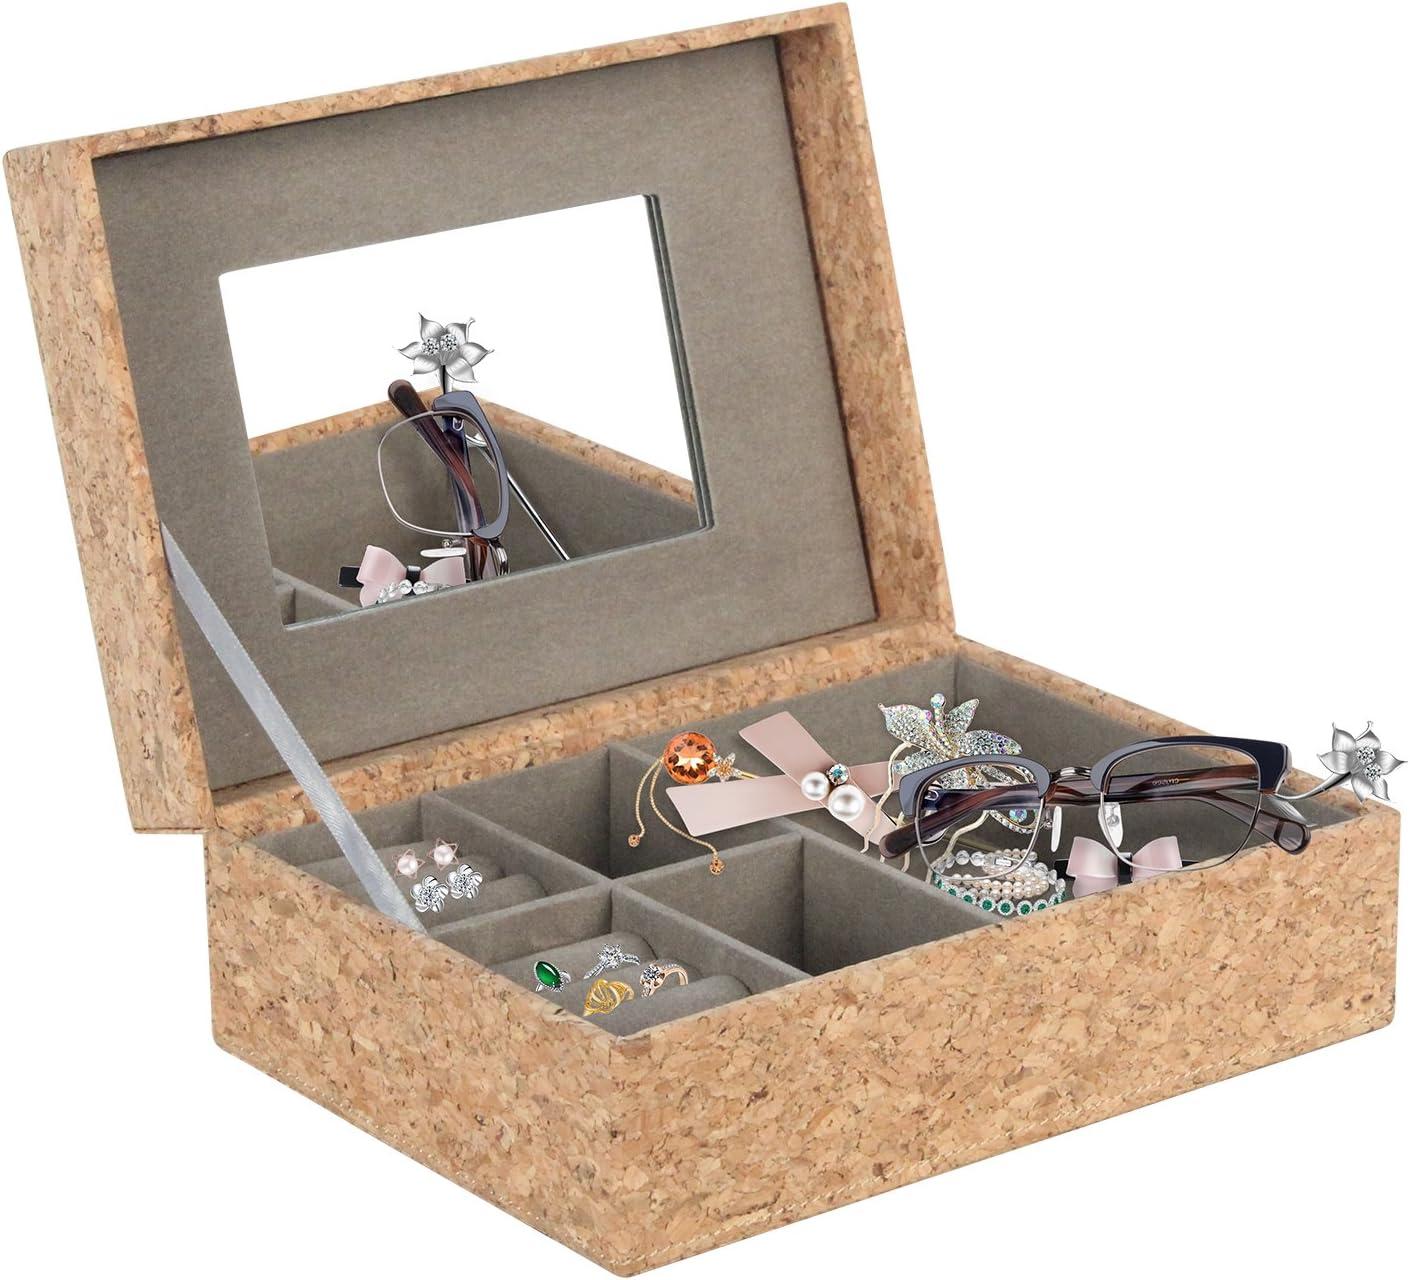 Vox Relojes Caja piel hombre negro reloj maletín Caja: Amazon.es: Hogar